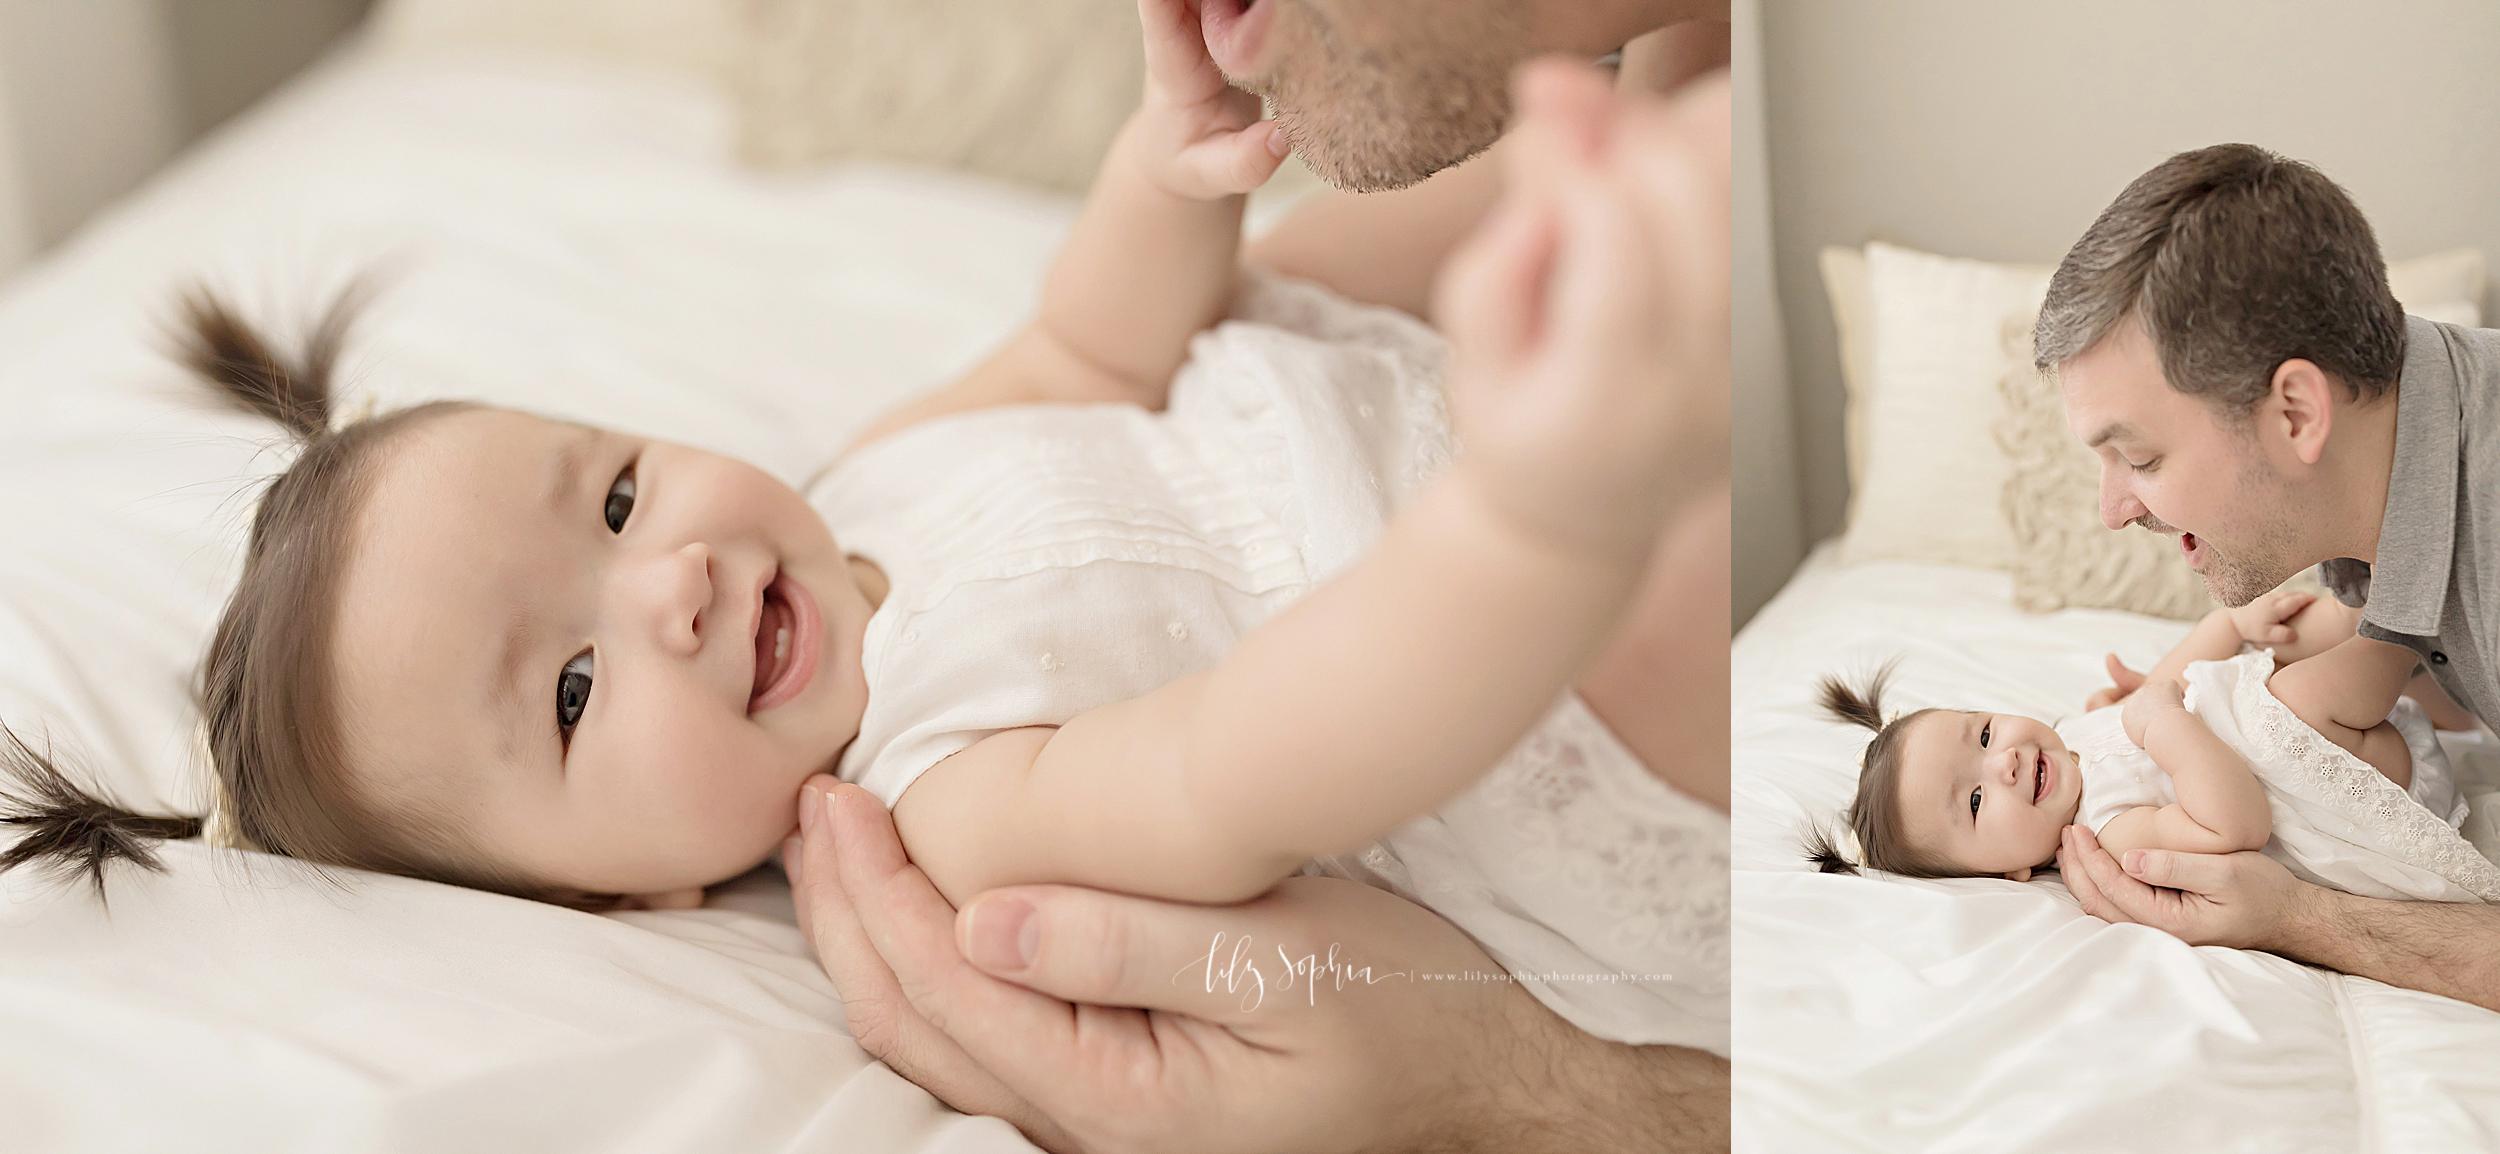 atlanta-midtown-brookhaven-decatur-lily-sophia-photography-photographer-portraits-grant-park-studio-six-month-milestone-baby-girl-big-sister-family_0115.jpg